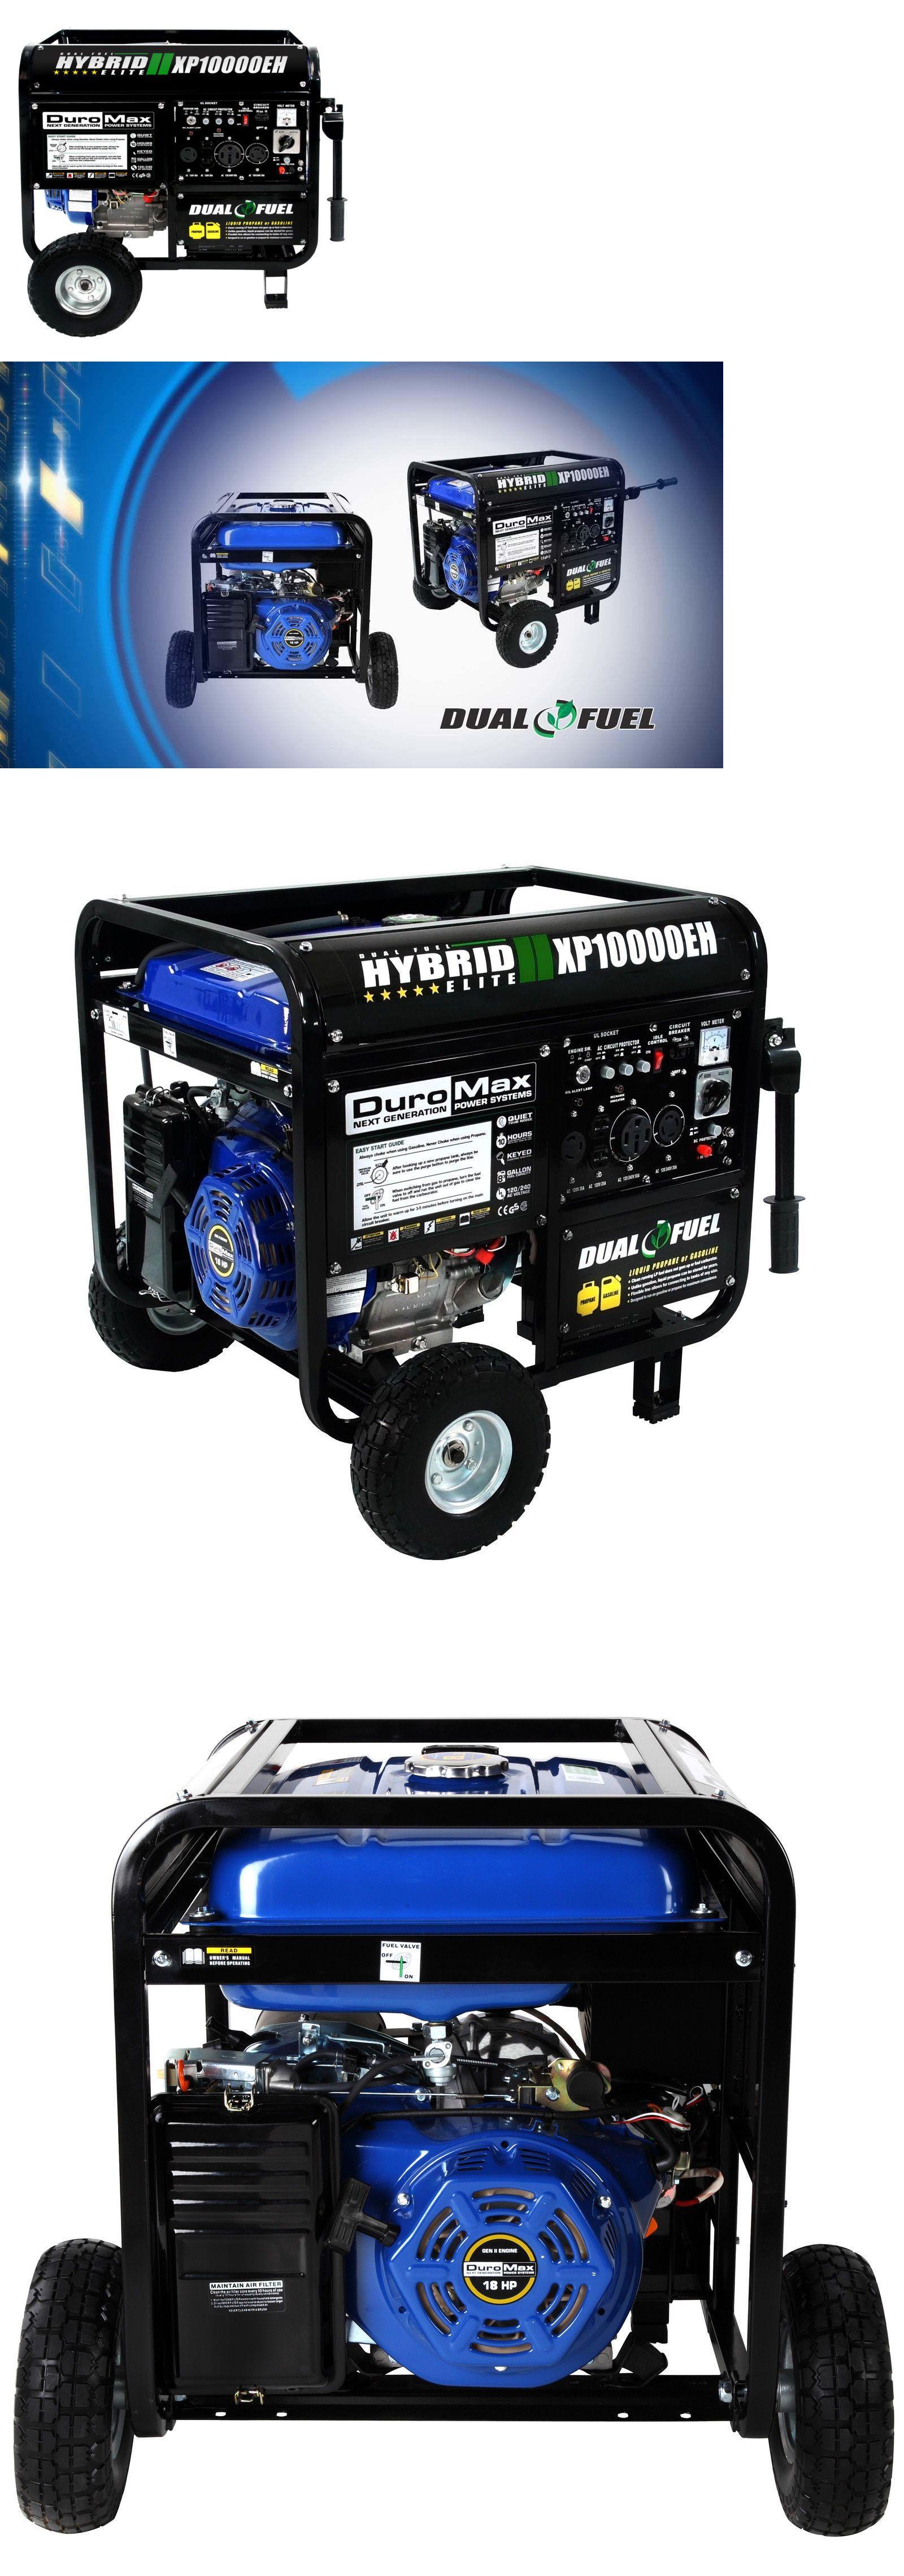 Generators Duromax Watt Hybrid Dual Fuel 18Hp Gas